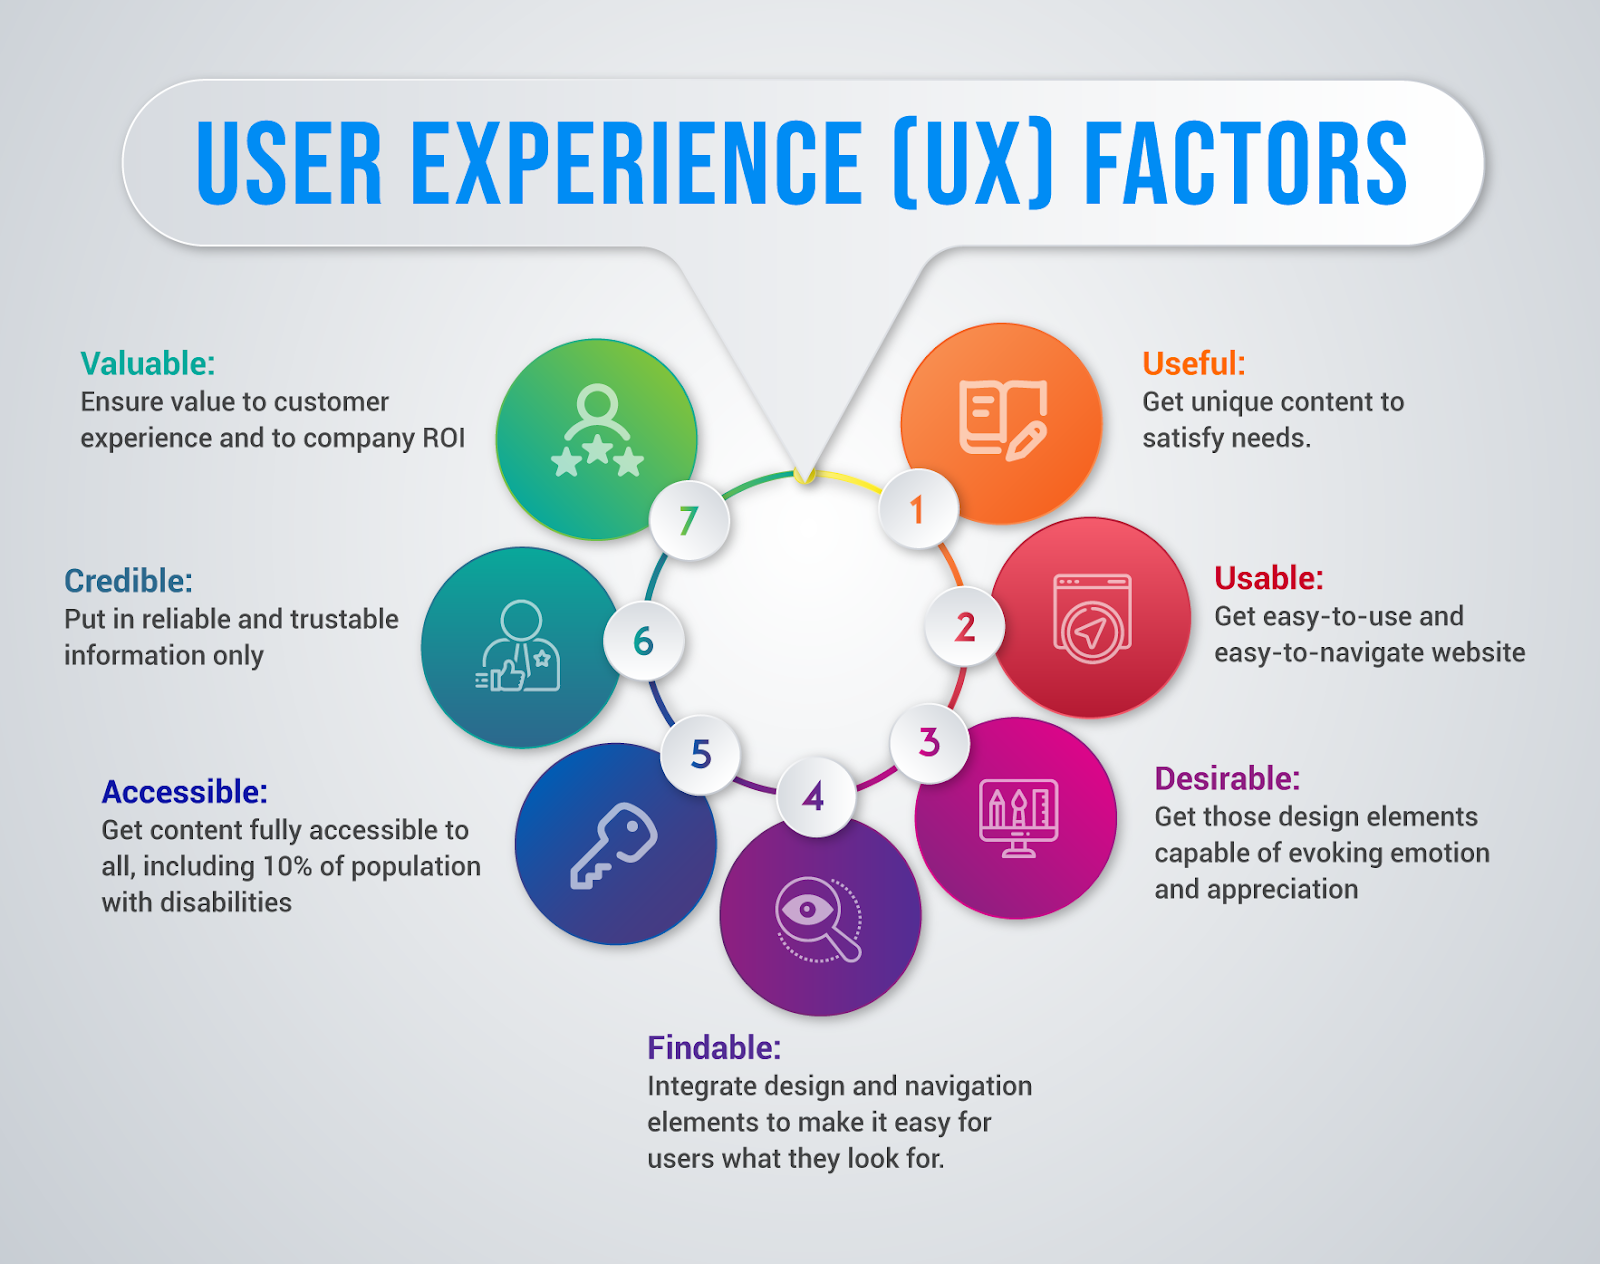 user experience factors